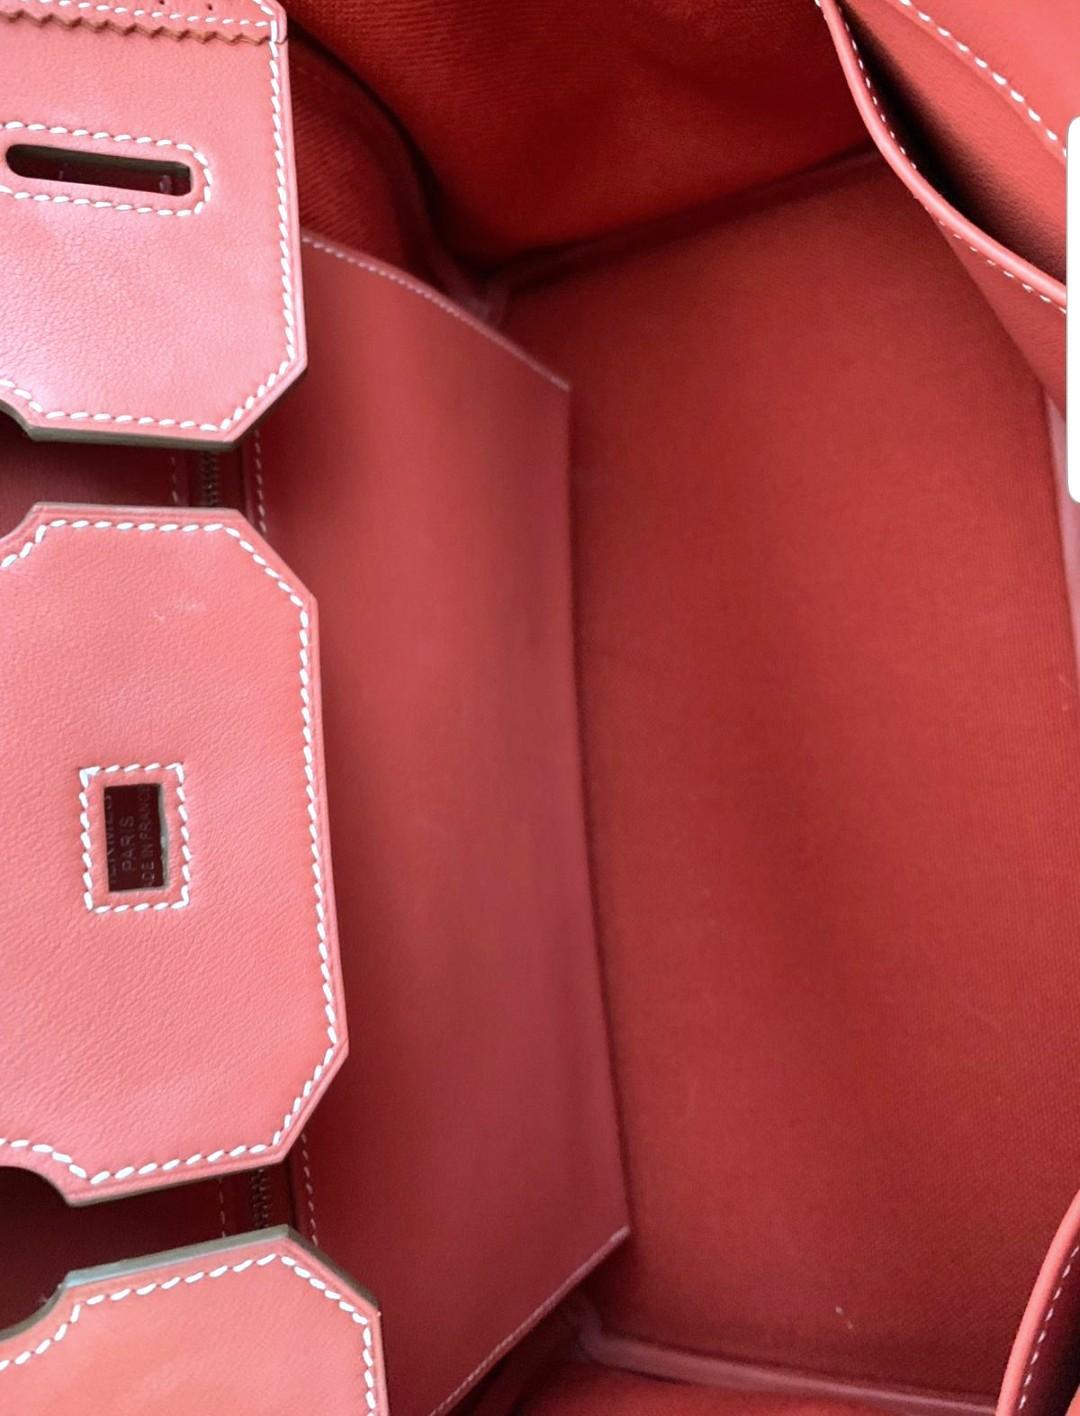 Rare Hermes Limited Edition 35cm Sanguine Swift Leather & Toile Ghillies Birkin Bag with Palladium Hardware